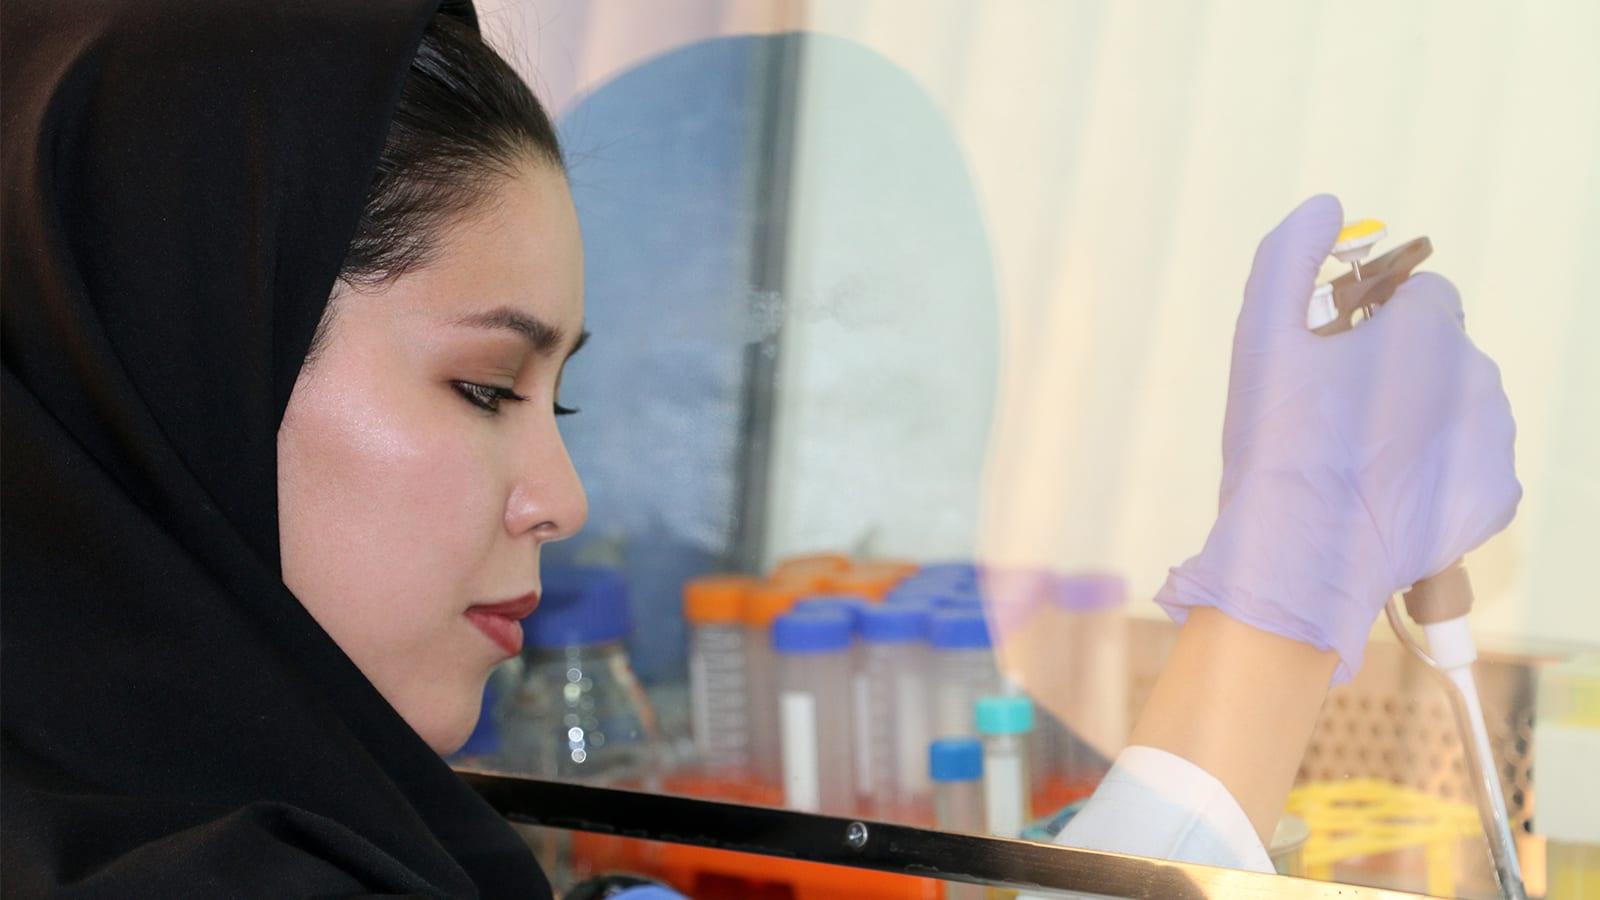 Fatemeh works in a lab